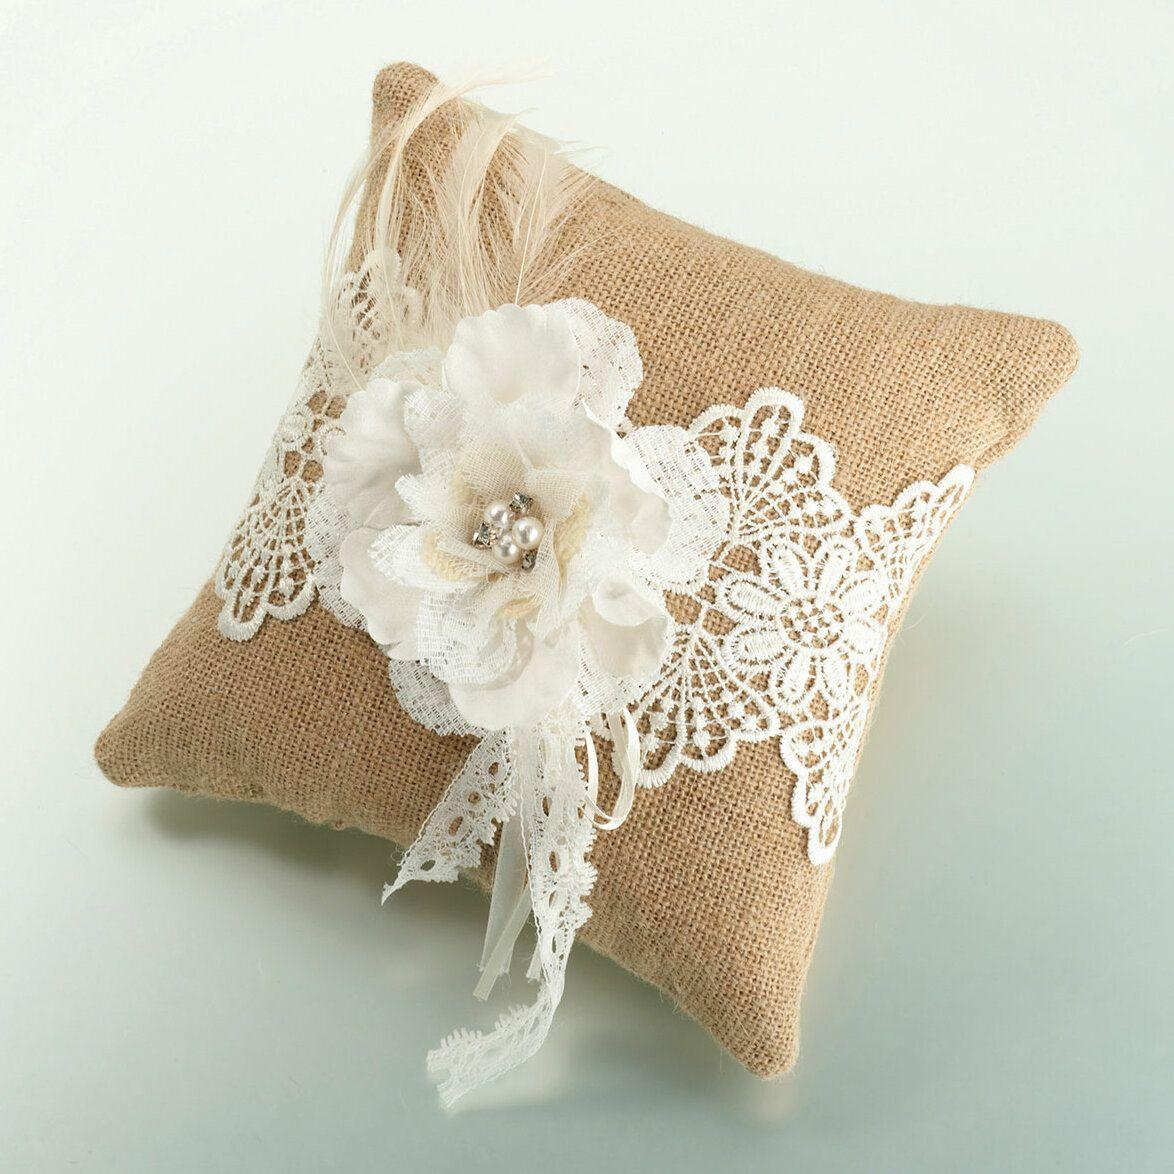 Vintage Ring Pillow~Lace Wedding Ring Cushion~Ring Bearer Cushion~Wedding Ring Holder~Vintage Wedding Decor~Rustic Wedding~Burlap Pillow